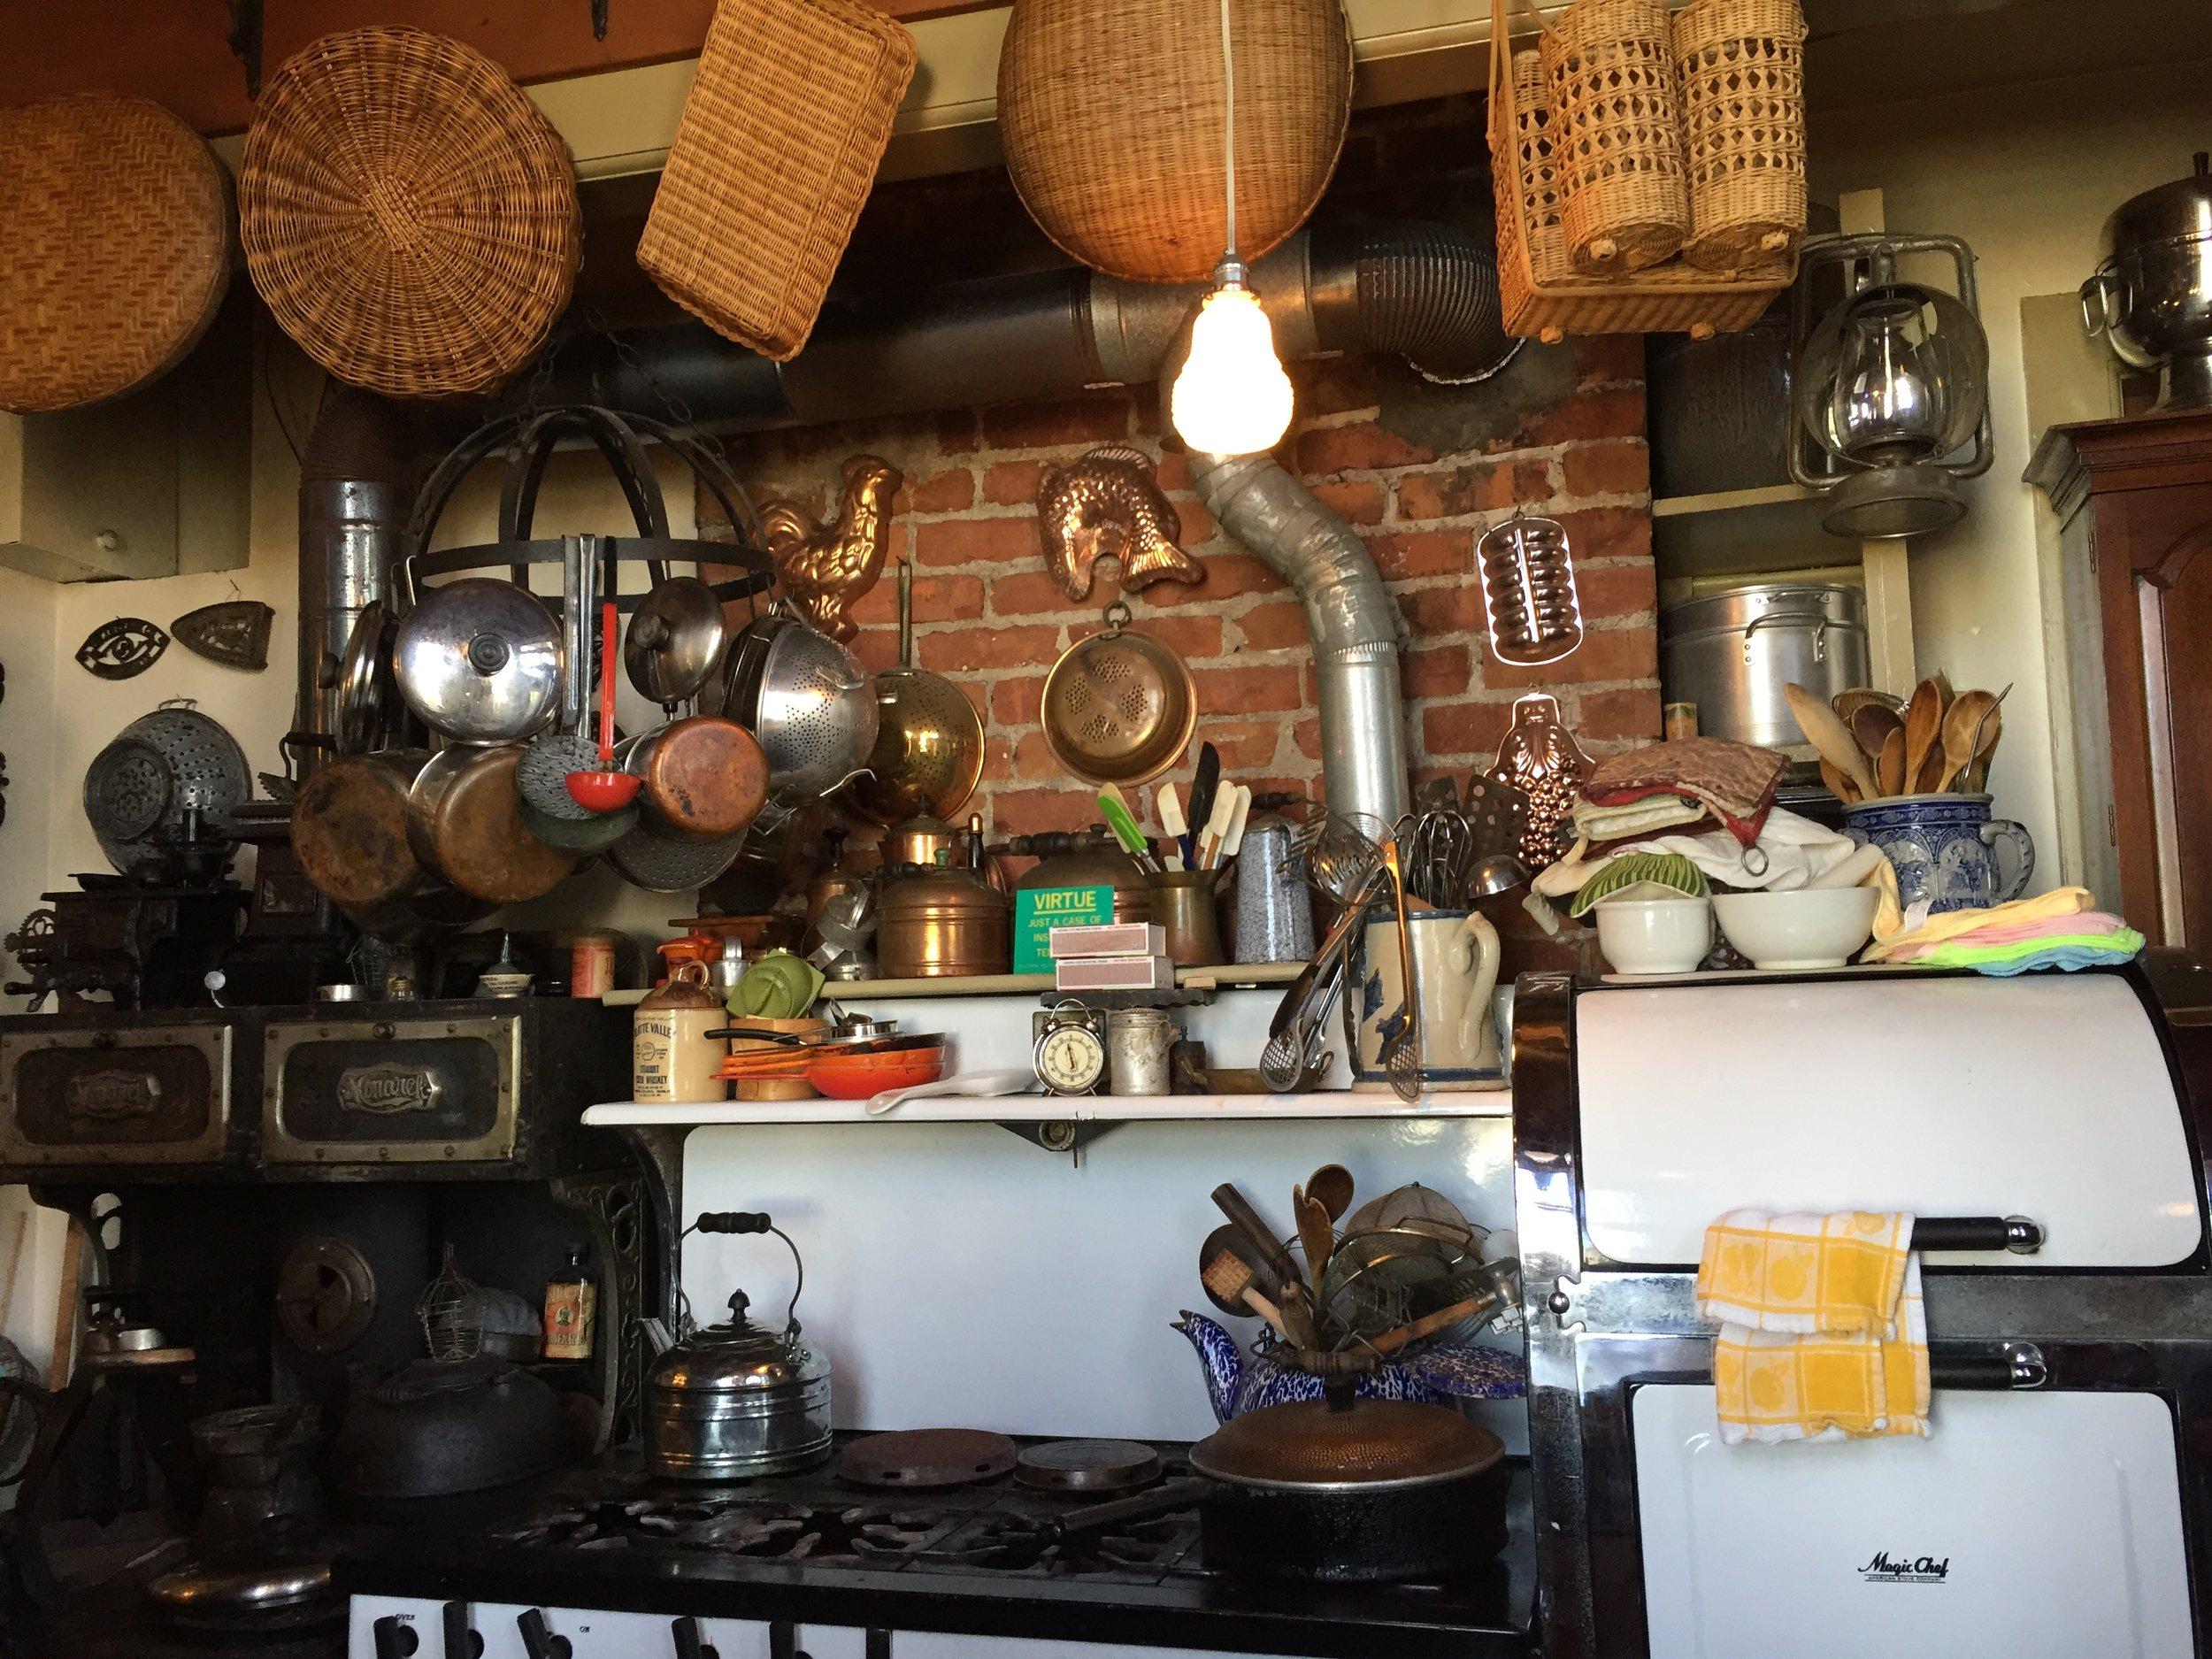 Kitchen in The Brune Reutlinger House